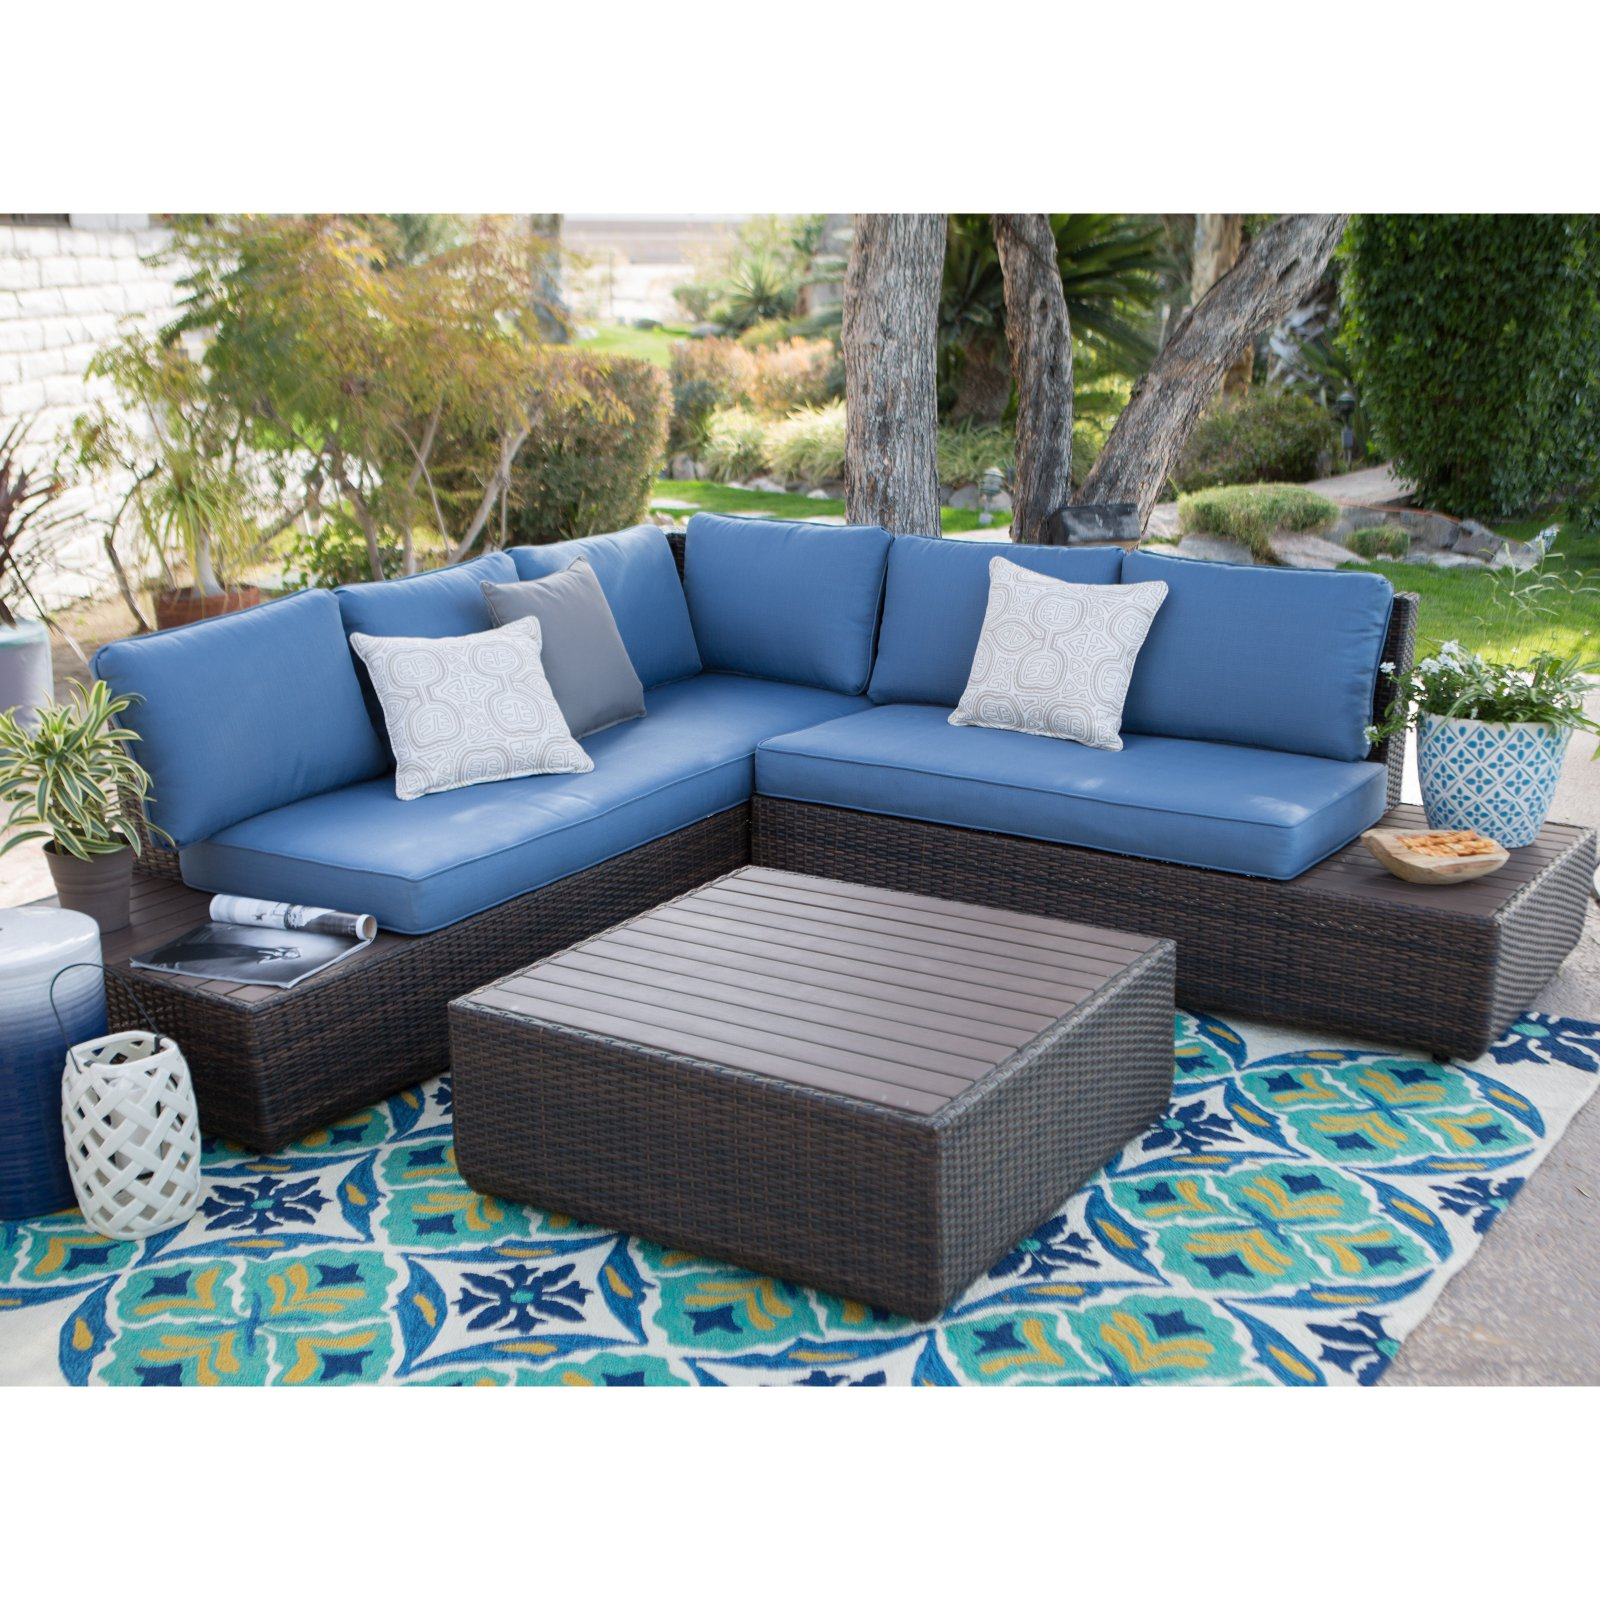 Favorite Belham Living Luciana Bay All Weather Wicker Loveseats With Cushions Regarding Wicker Loveseats (View 20 of 20)